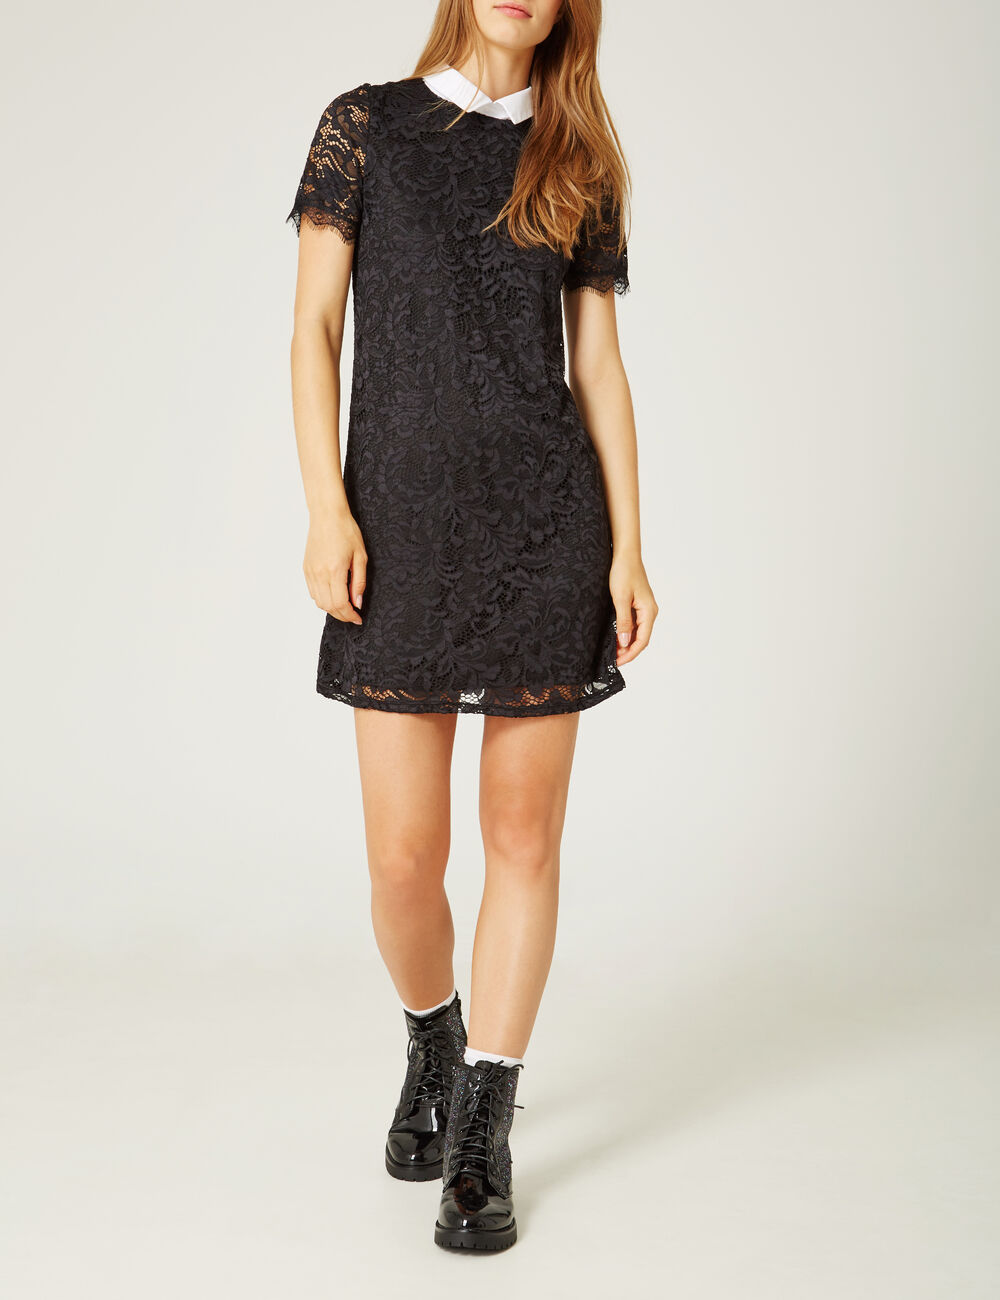 Petite robe noire prix algerie